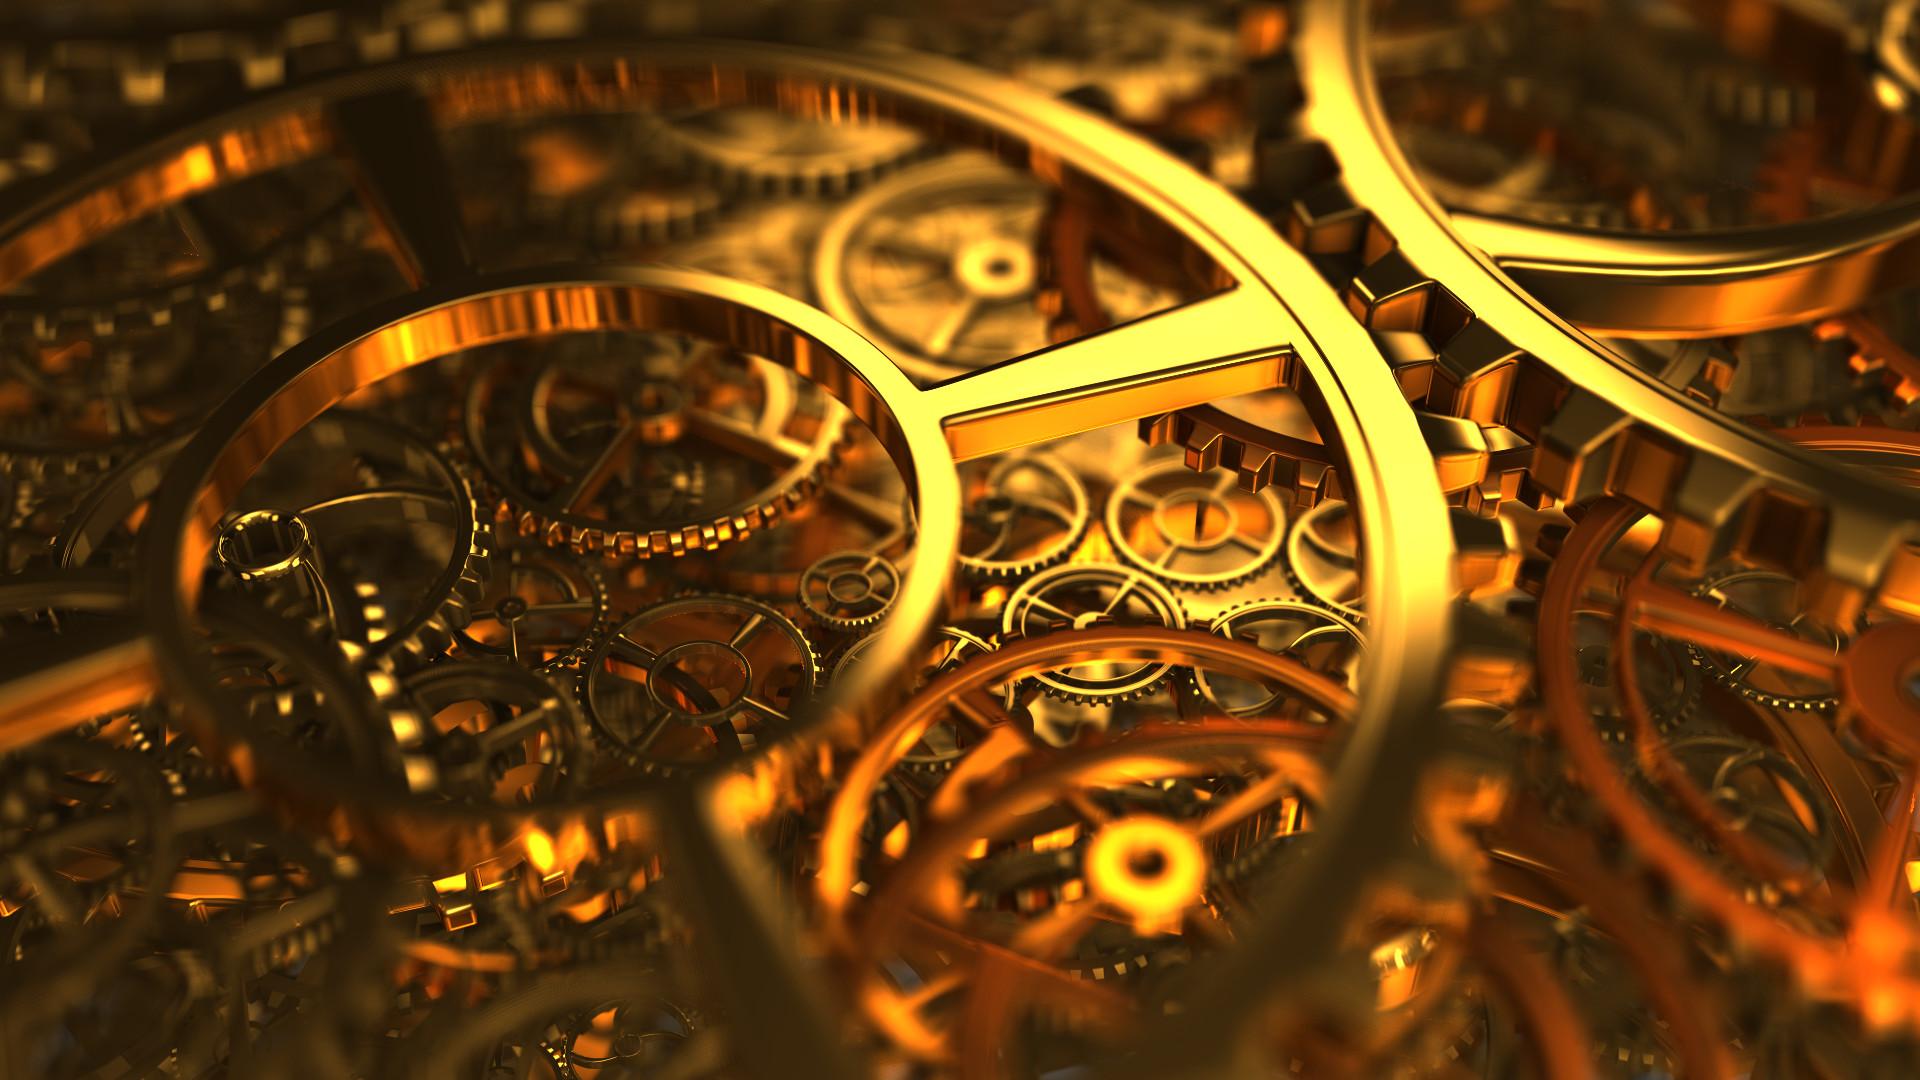 Clocks Wallpapers | Resolution: px, Margarette Clara